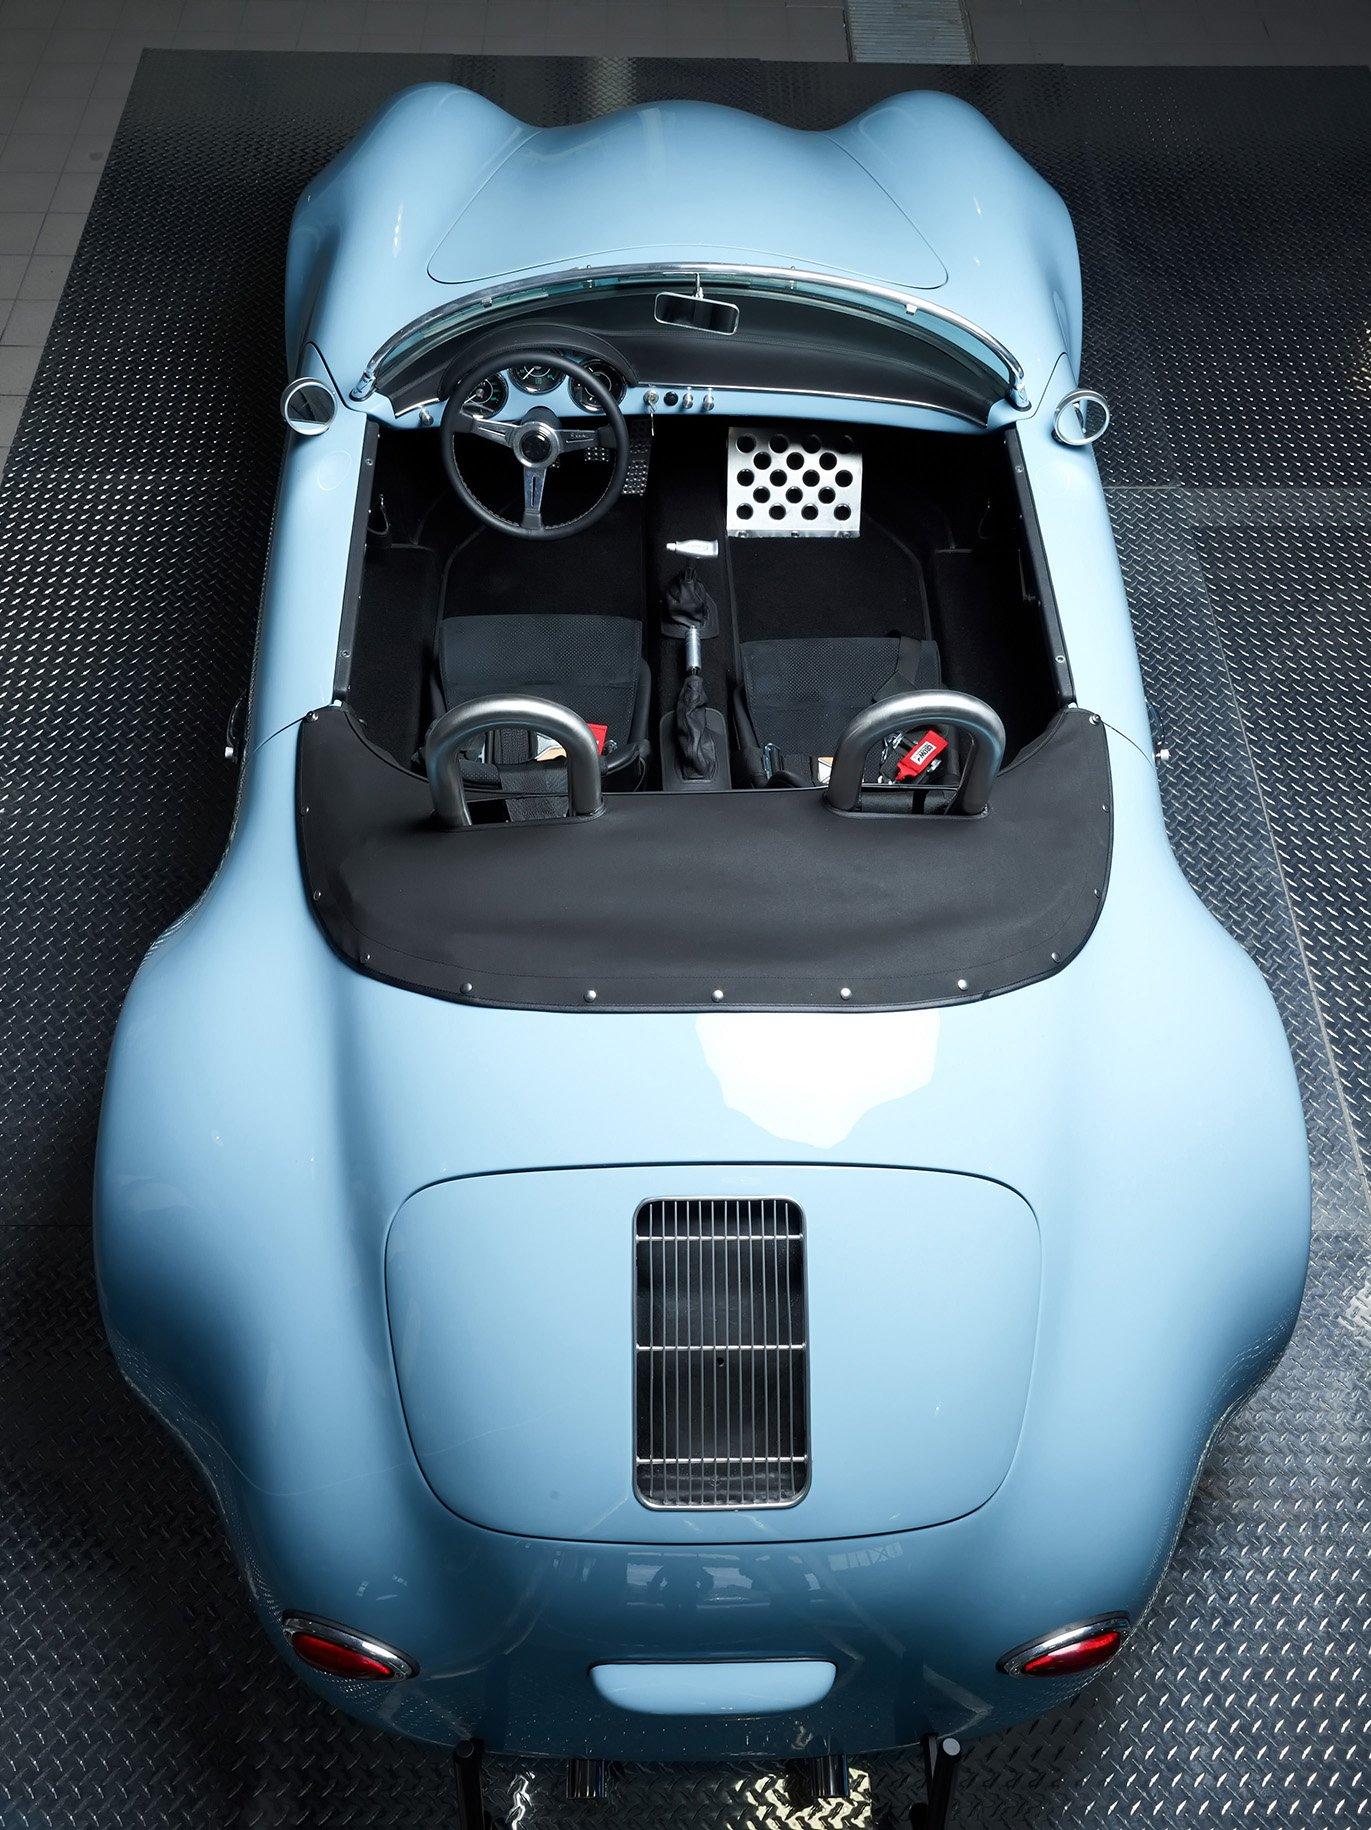 RCH 356 Wide Body Blue top